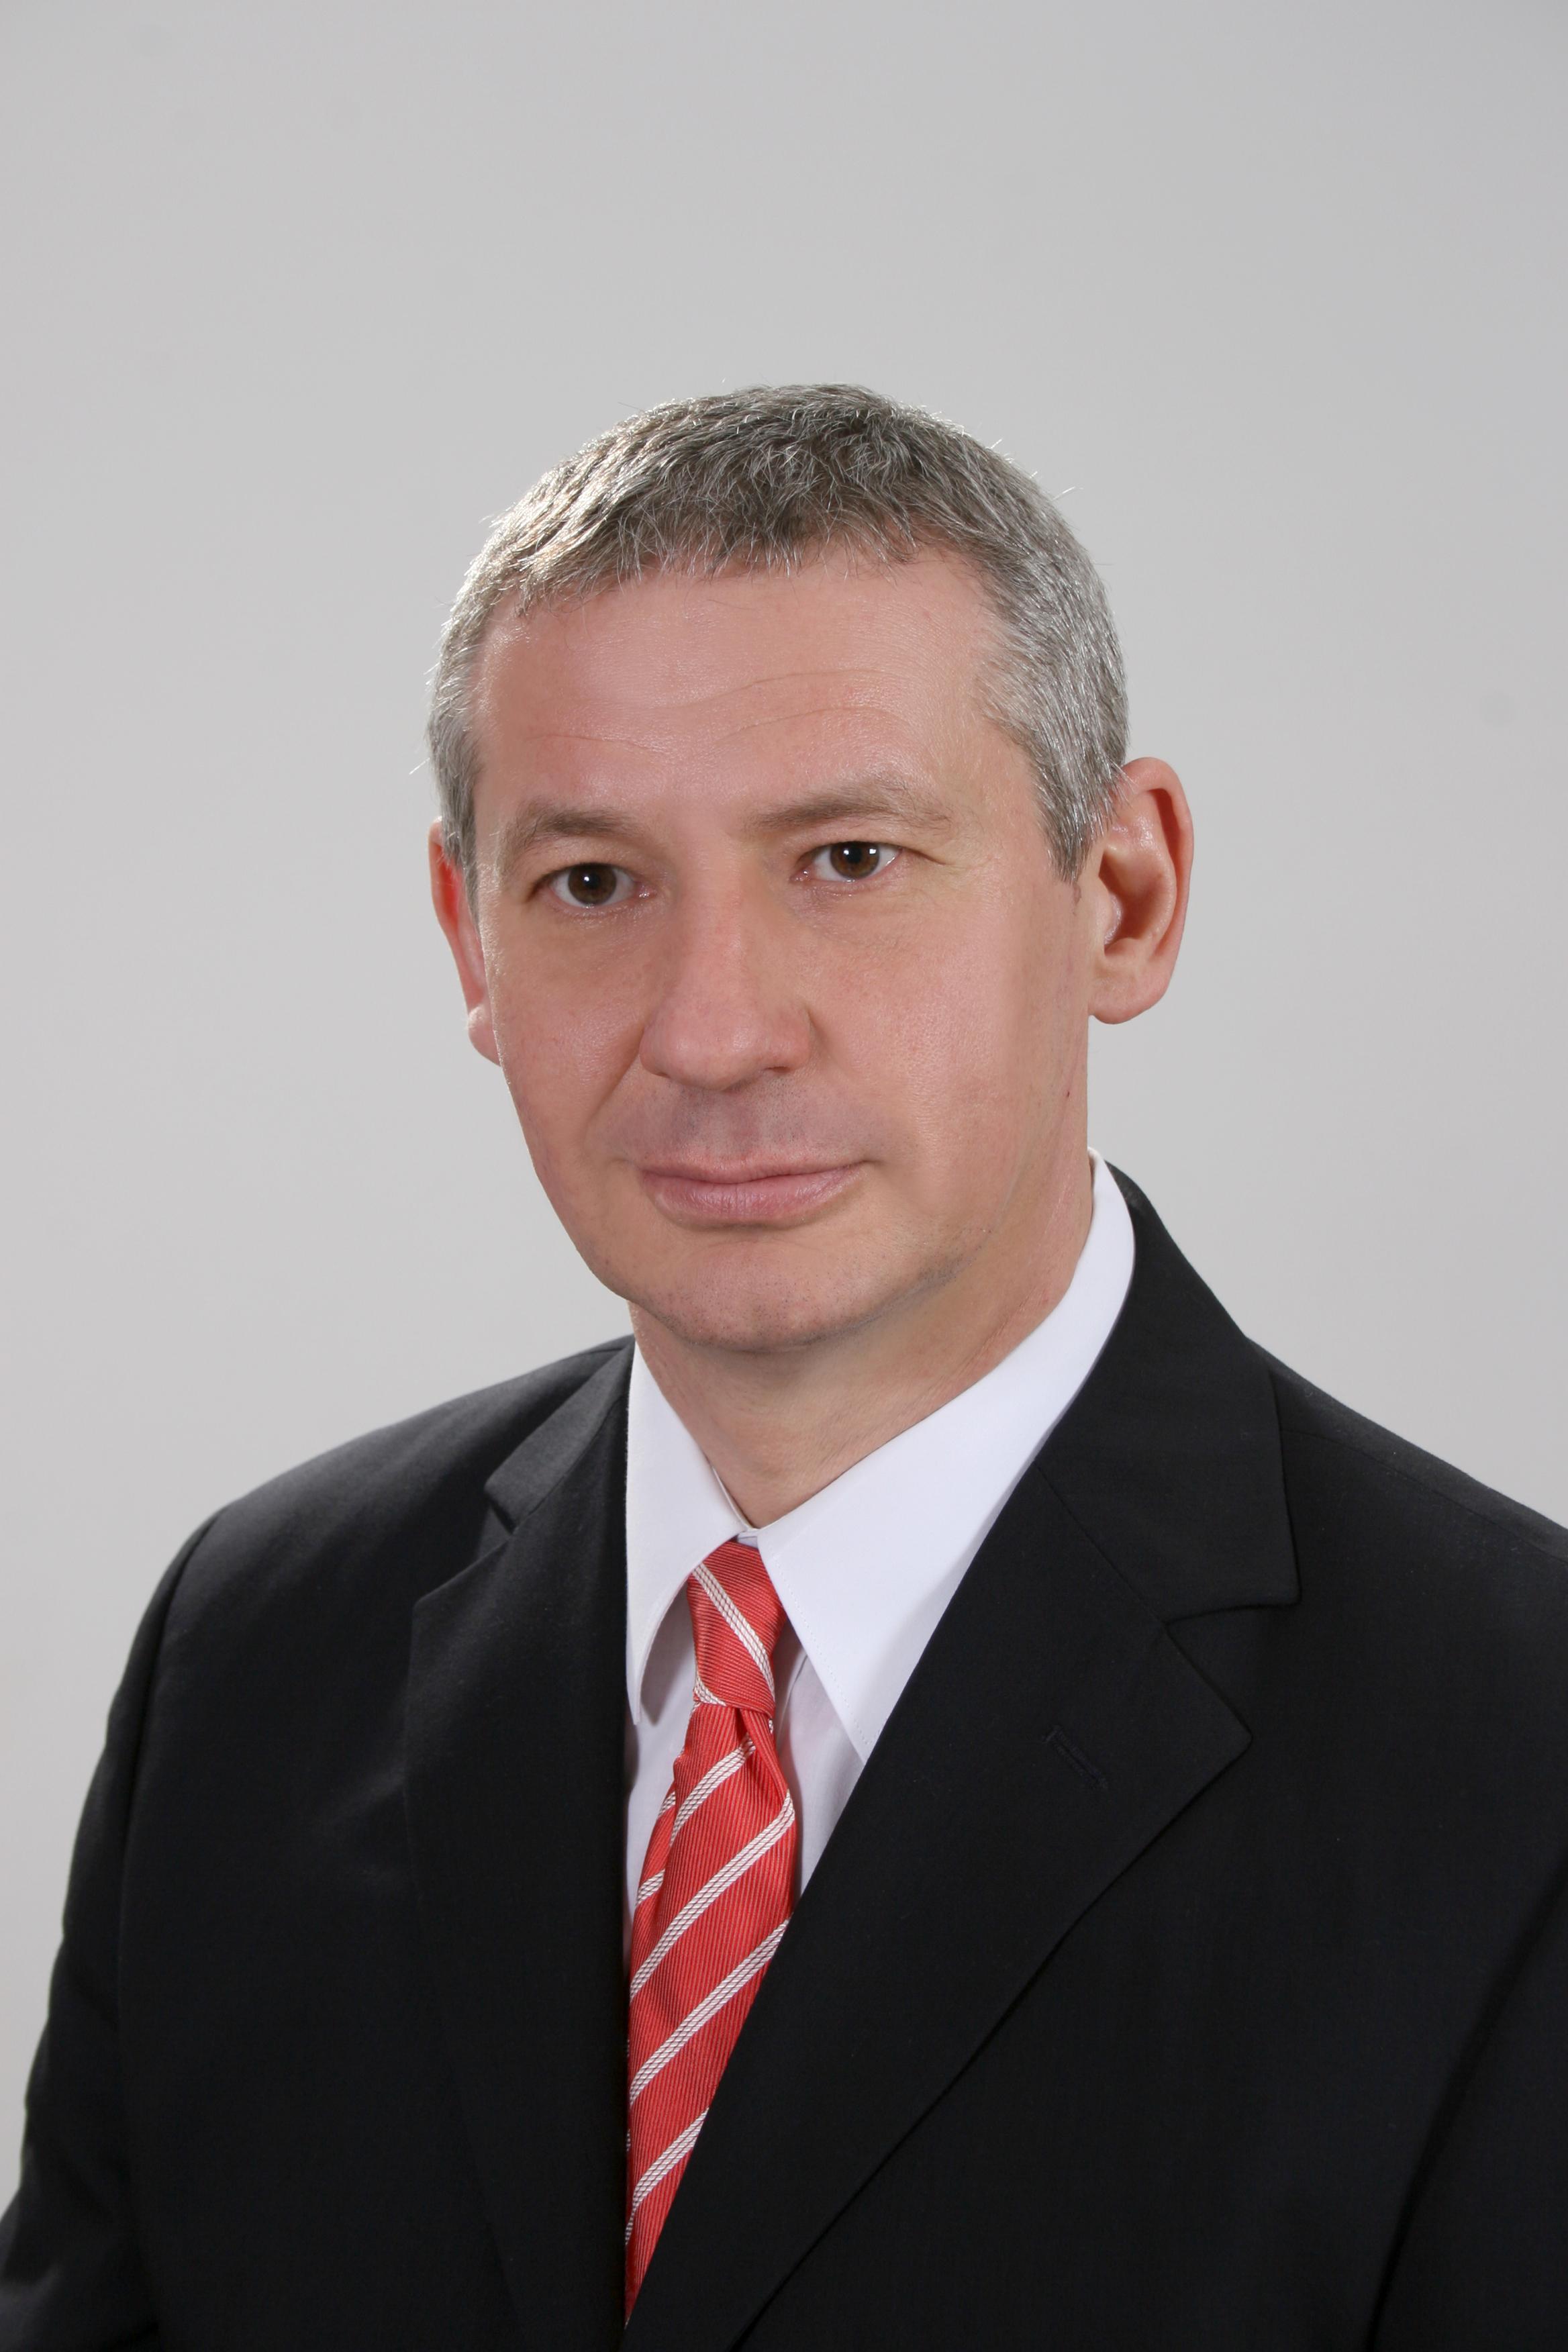 Dr Jónás Zoltán R